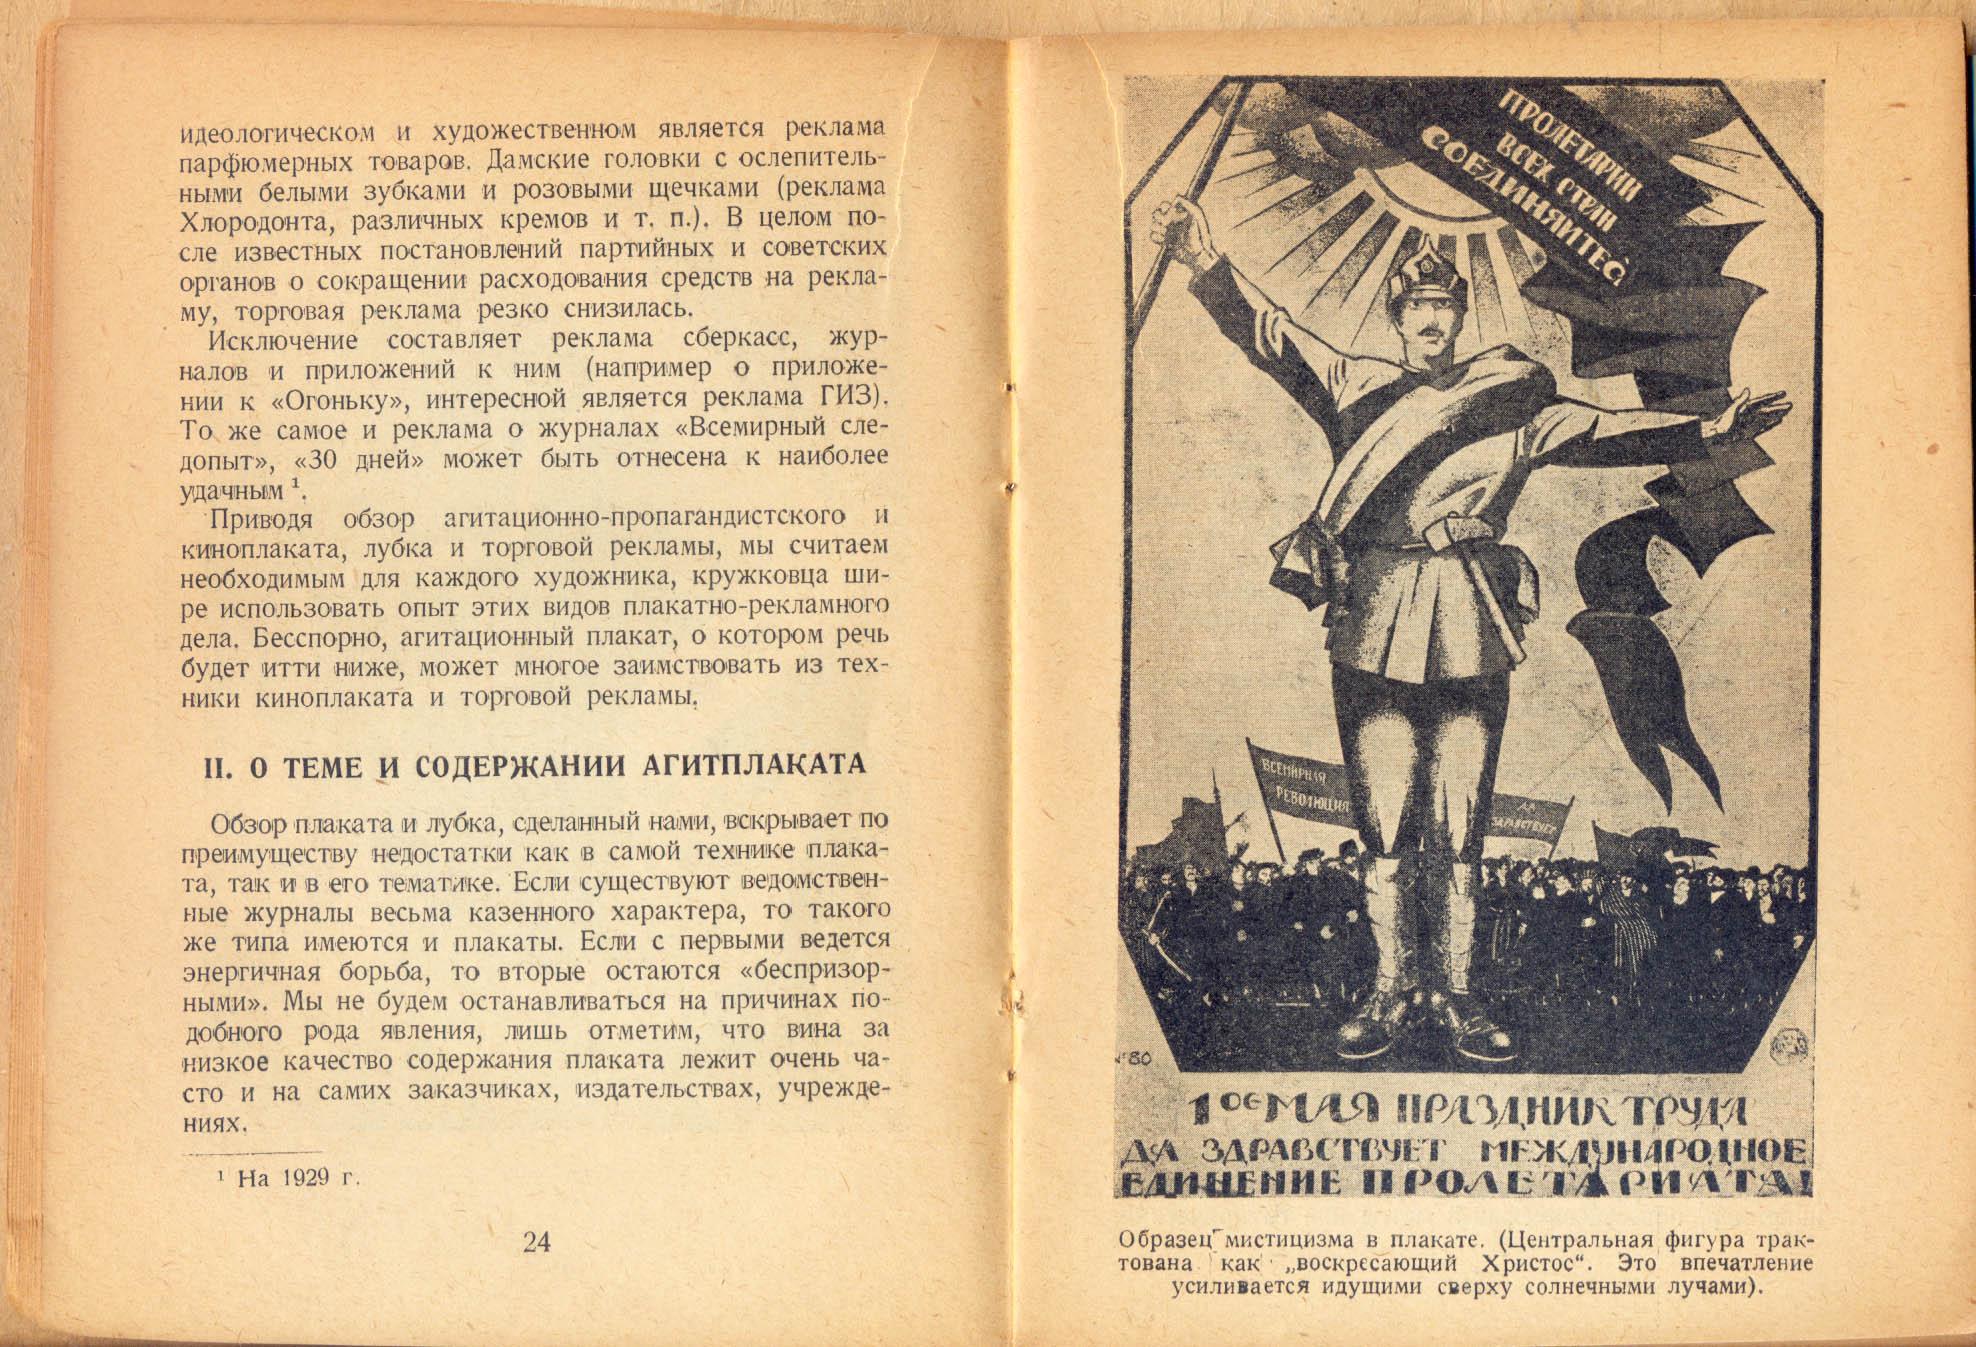 плакат 24.jpg